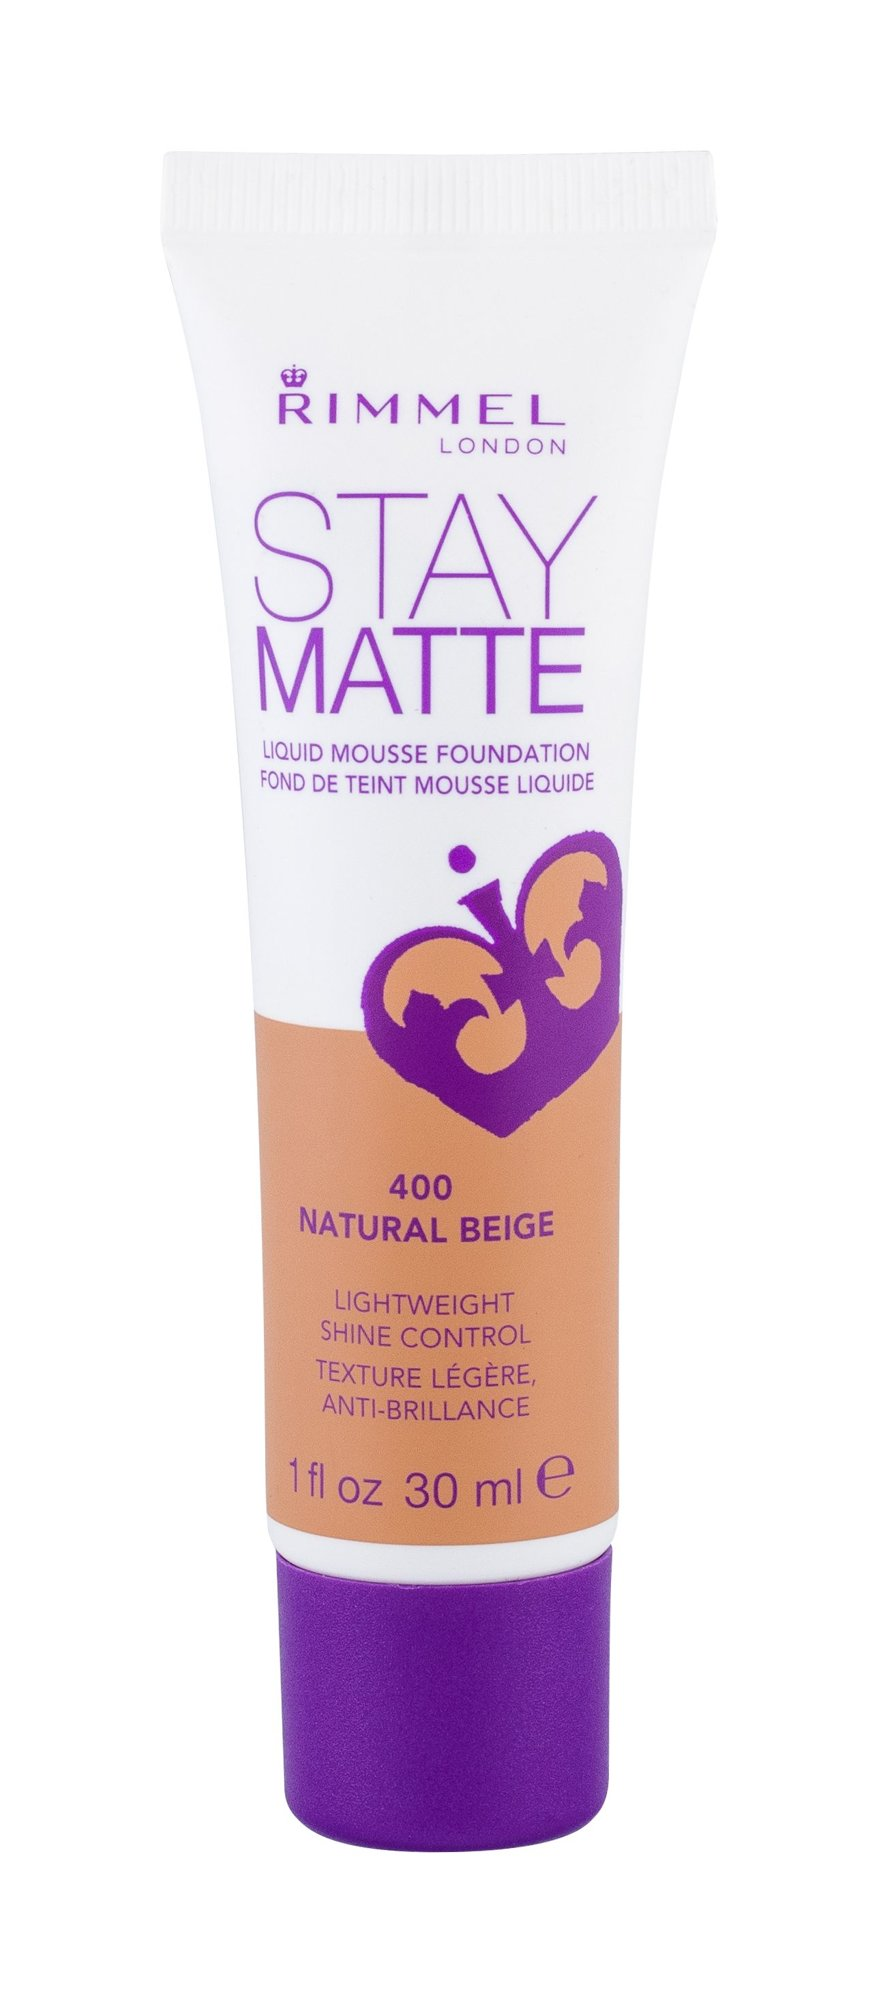 Rimmel London Stay Matte Makeup 30ml 400 Natural Beige